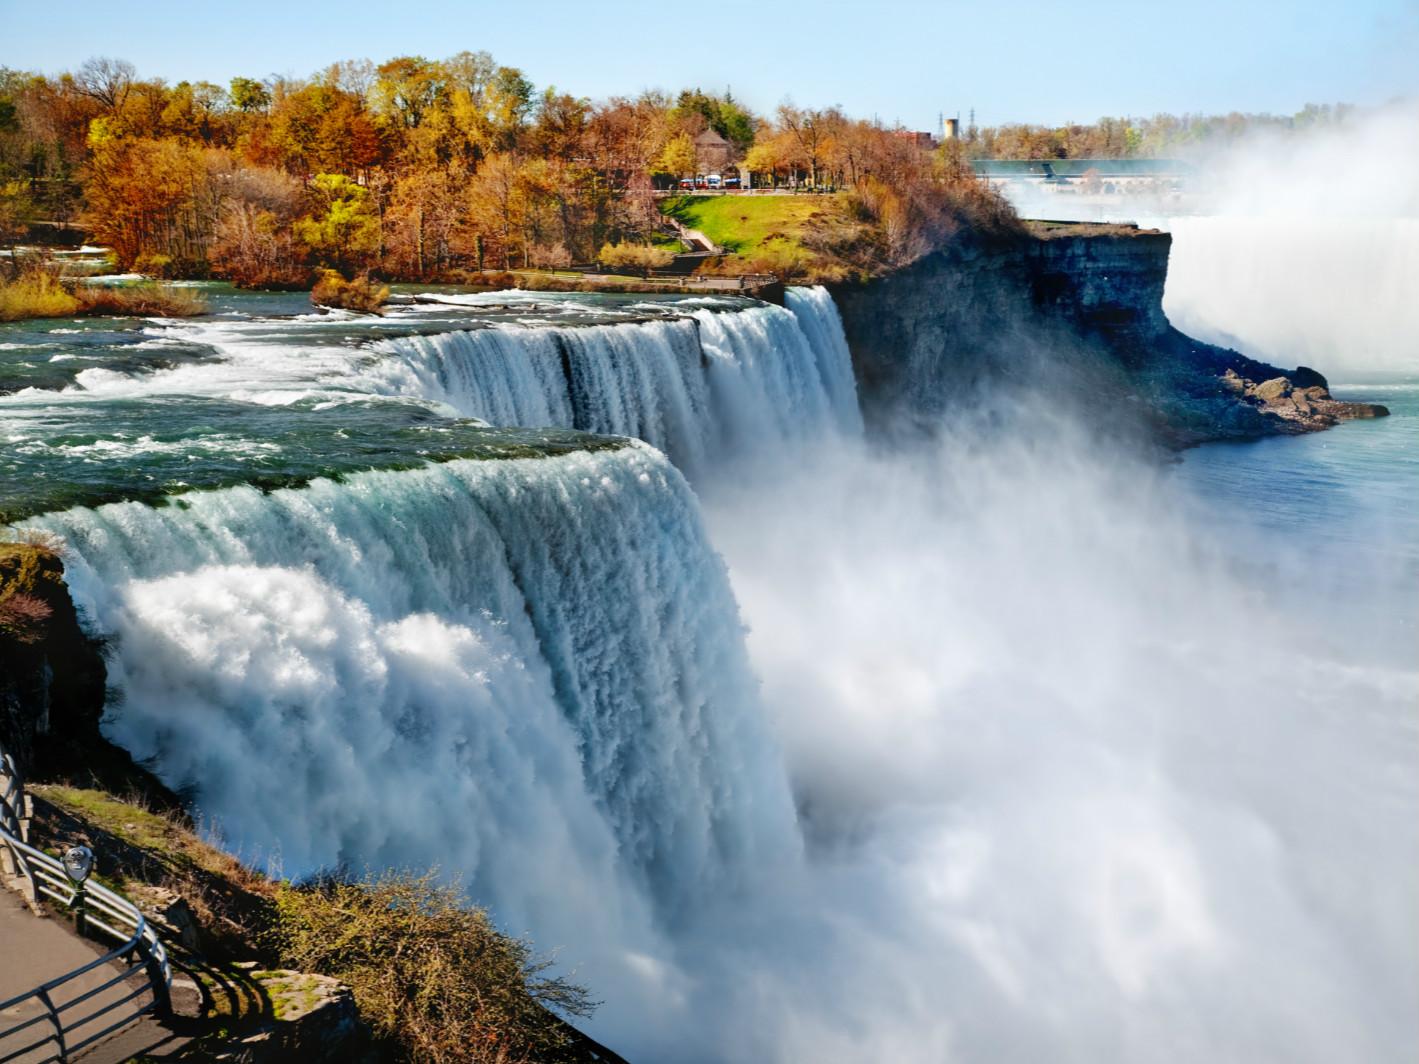 3-Day Cuyahoga Valley National Park, Niagara Falls, Indiana Du...